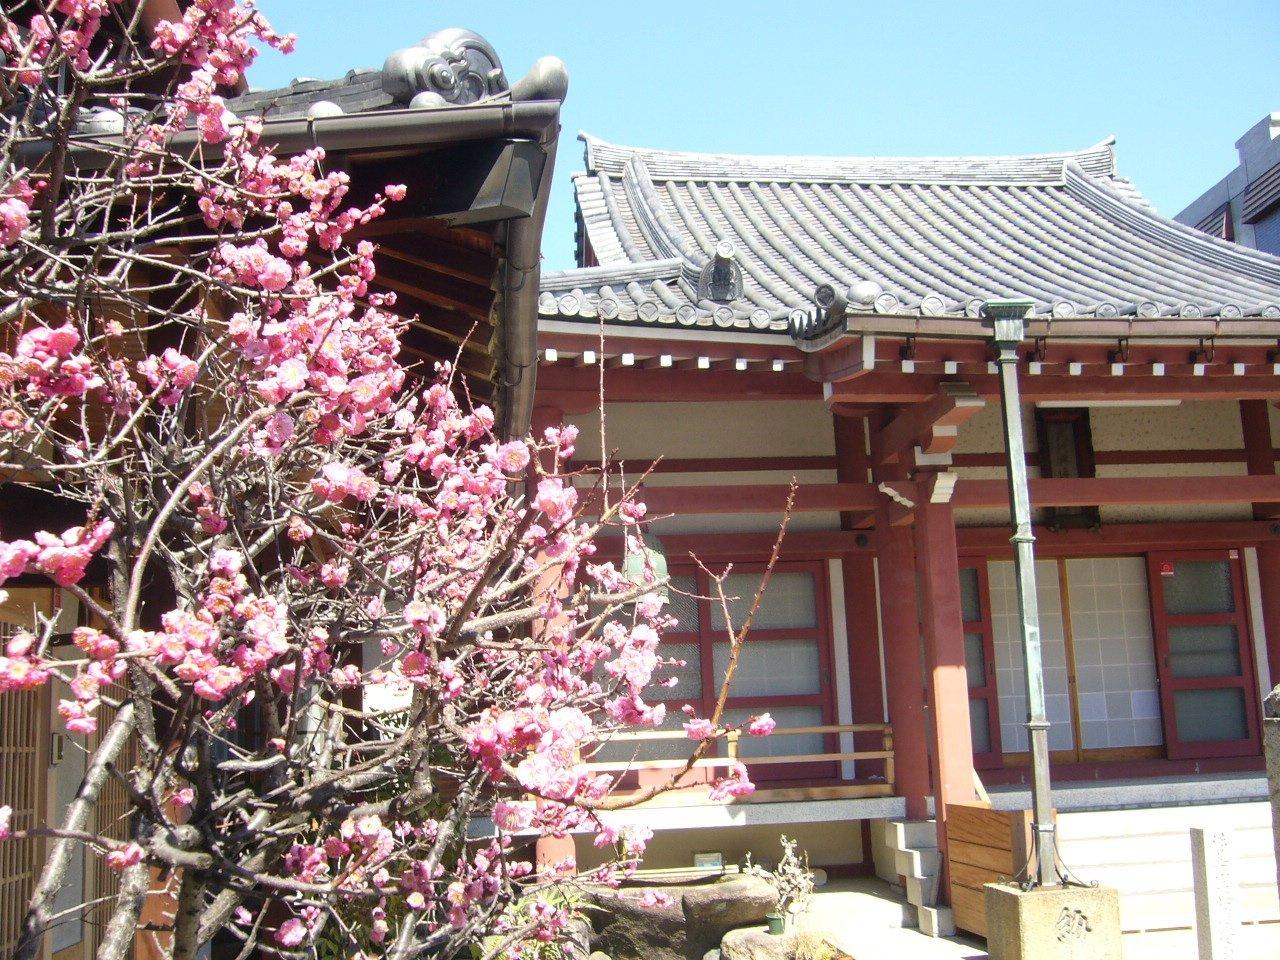 枚方市の寺院 大隆寺_c0112559_09262750.jpg